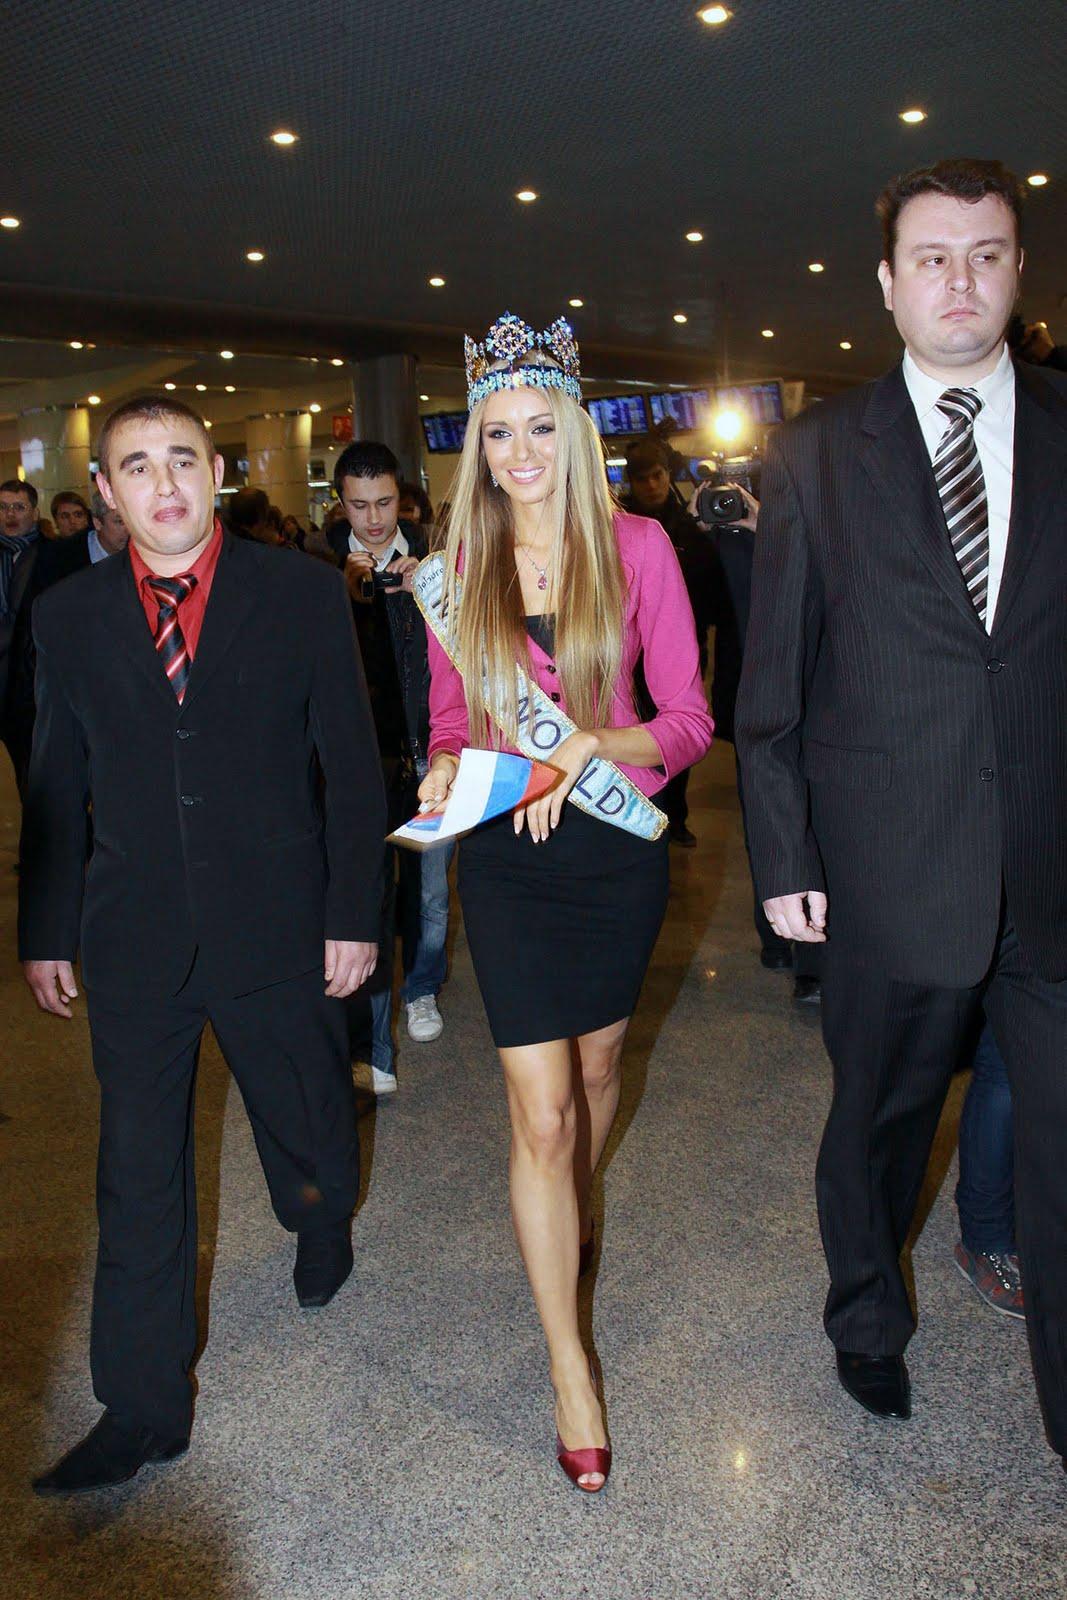 http://2.bp.blogspot.com/_UaLWp72nij4/S-88tvqmFmI/AAAAAAAALV4/uE5yMBWtMyg/s1600/ksenia-sukhinova-feet-3.jpg